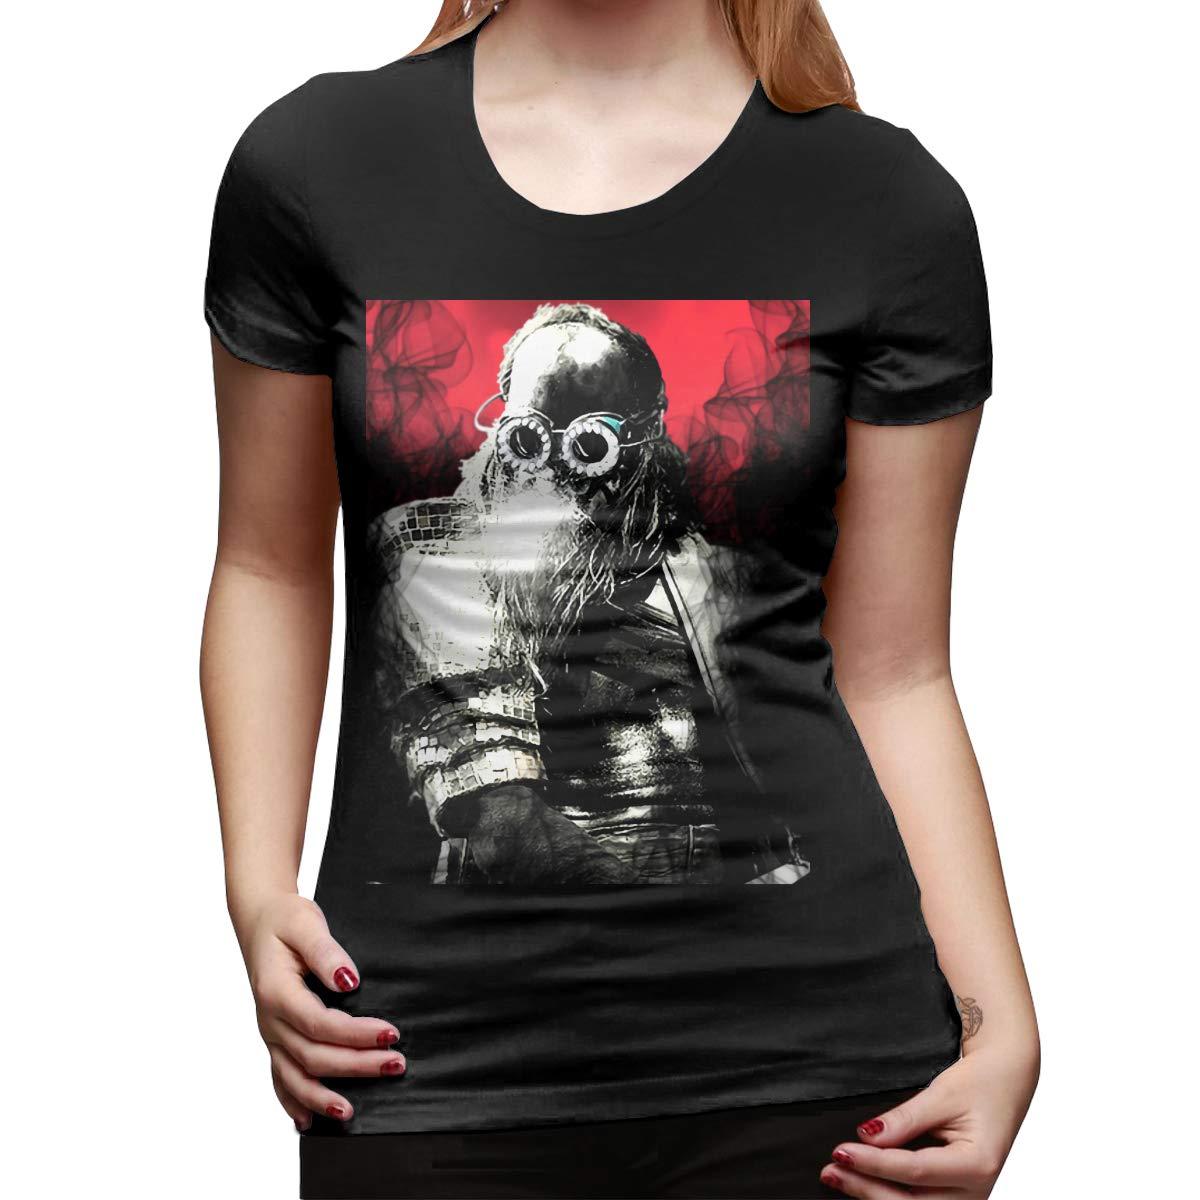 Limp Bizkit Cool Short Sleeve Black Shirts